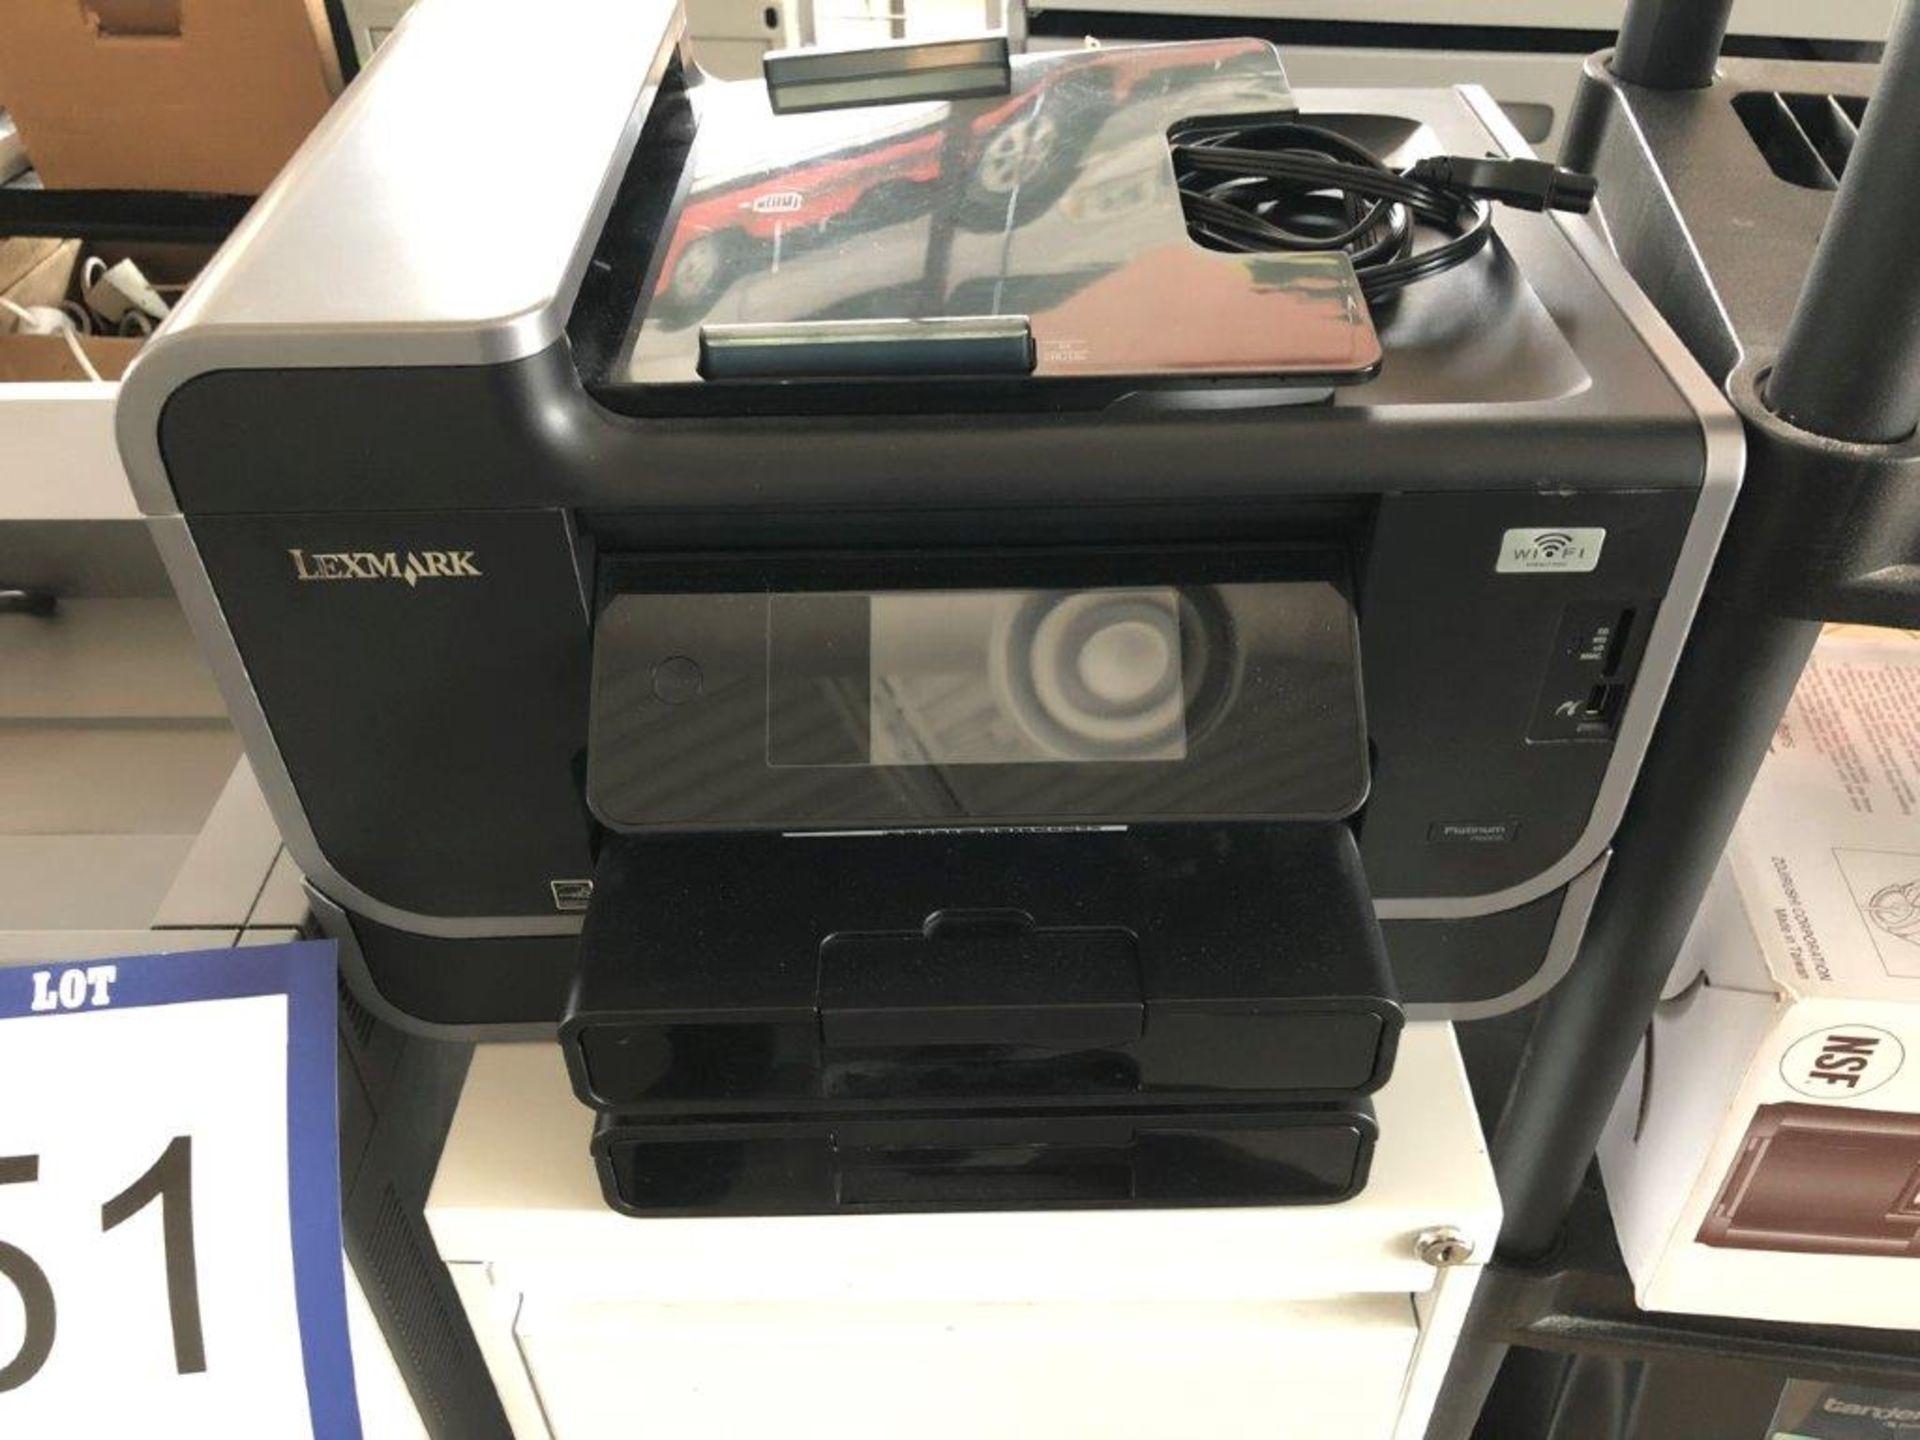 Lot 51 - Lot: cabinet, imprimante LEXMARK Mod. PLATINUM PRO905 et imprimante LEXMARK Mod. C792de